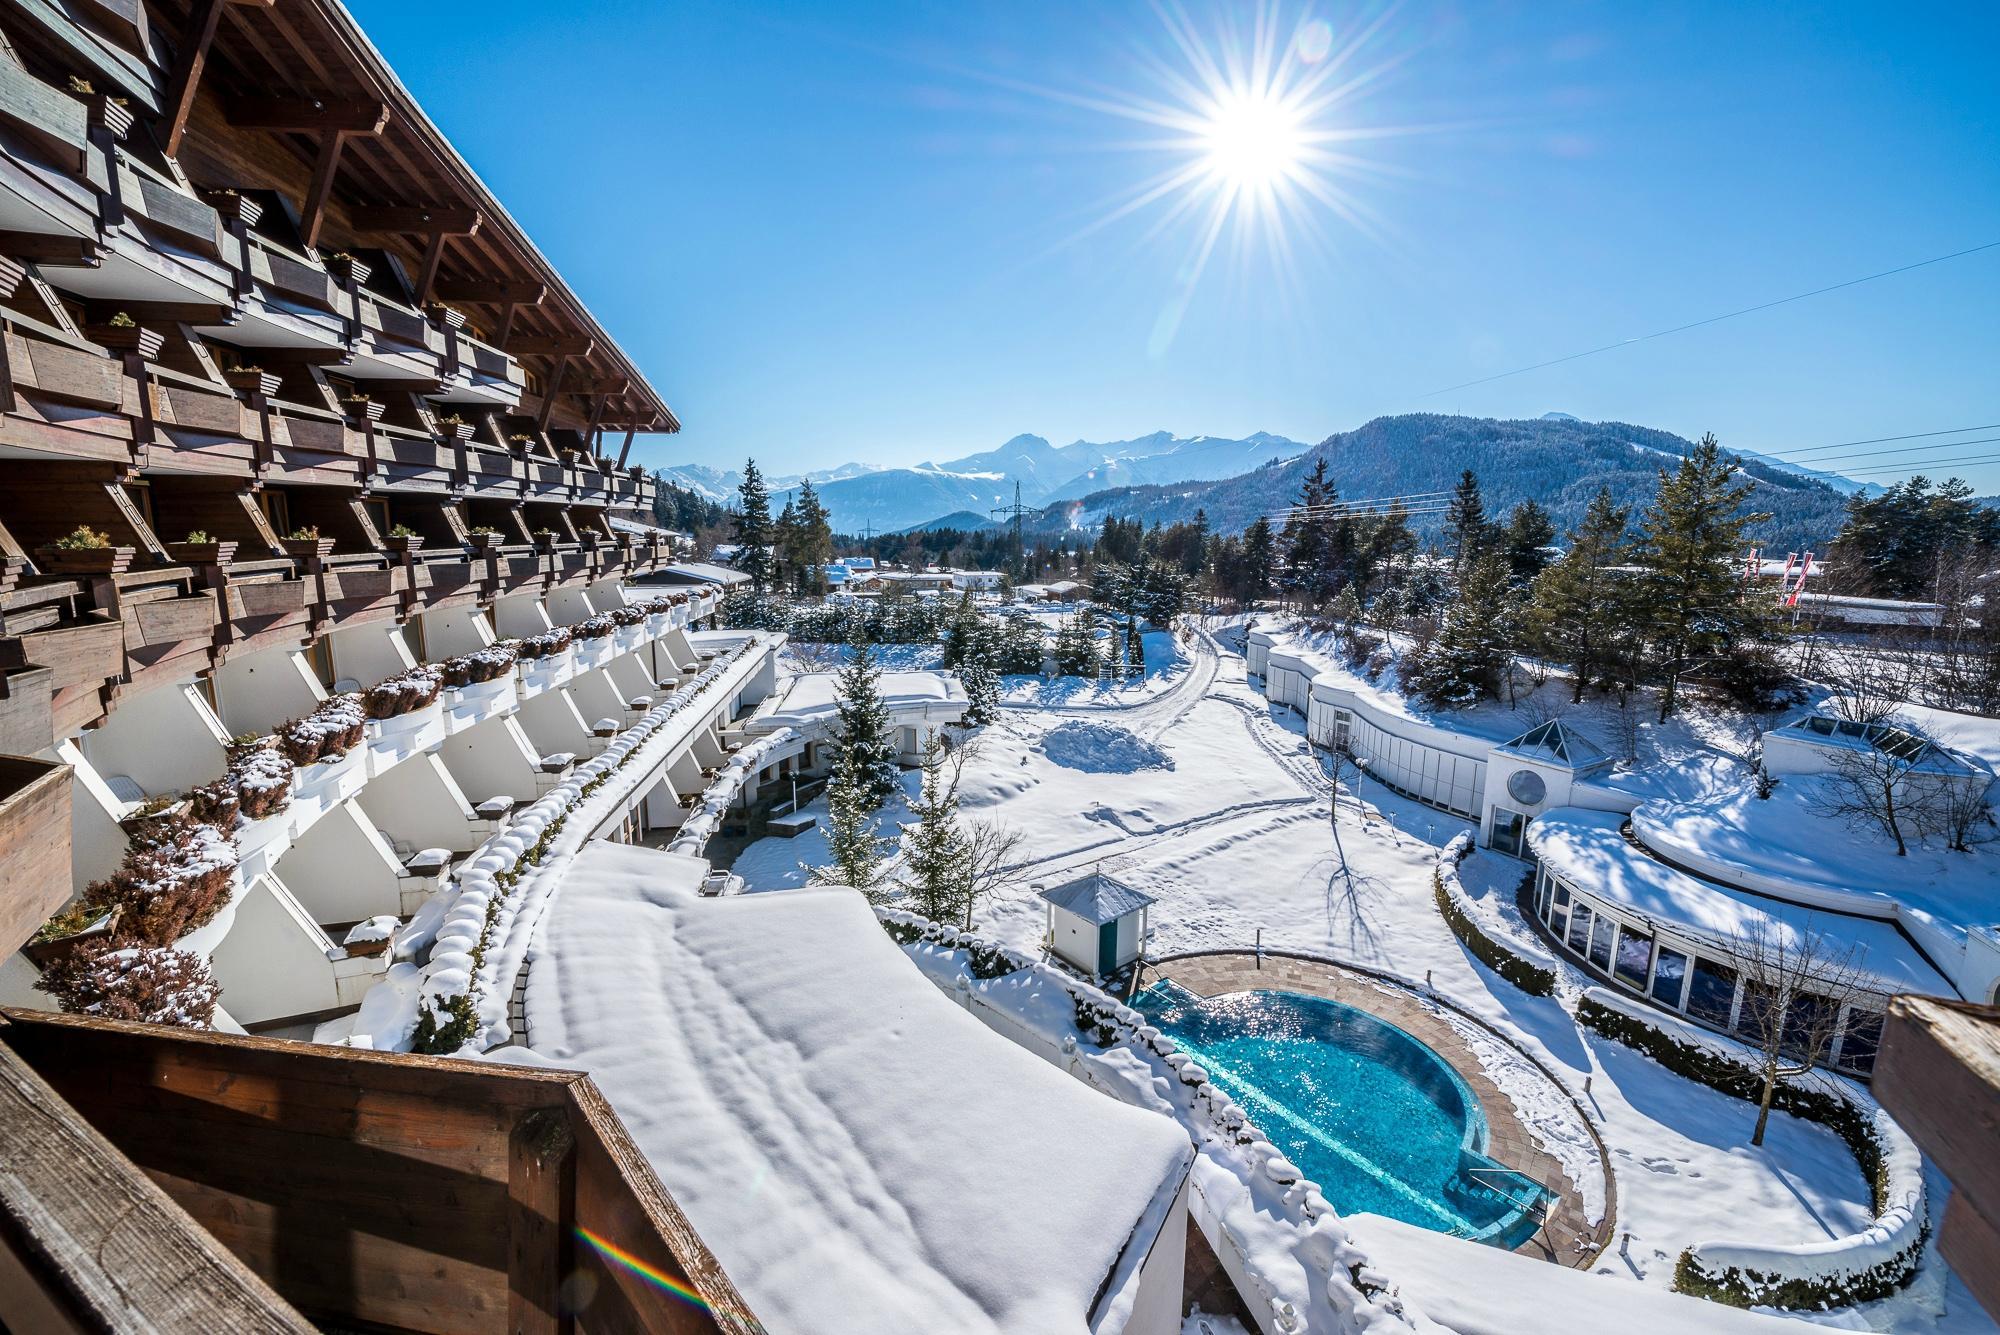 Dorint Alpin Resort Seefeld Tirol